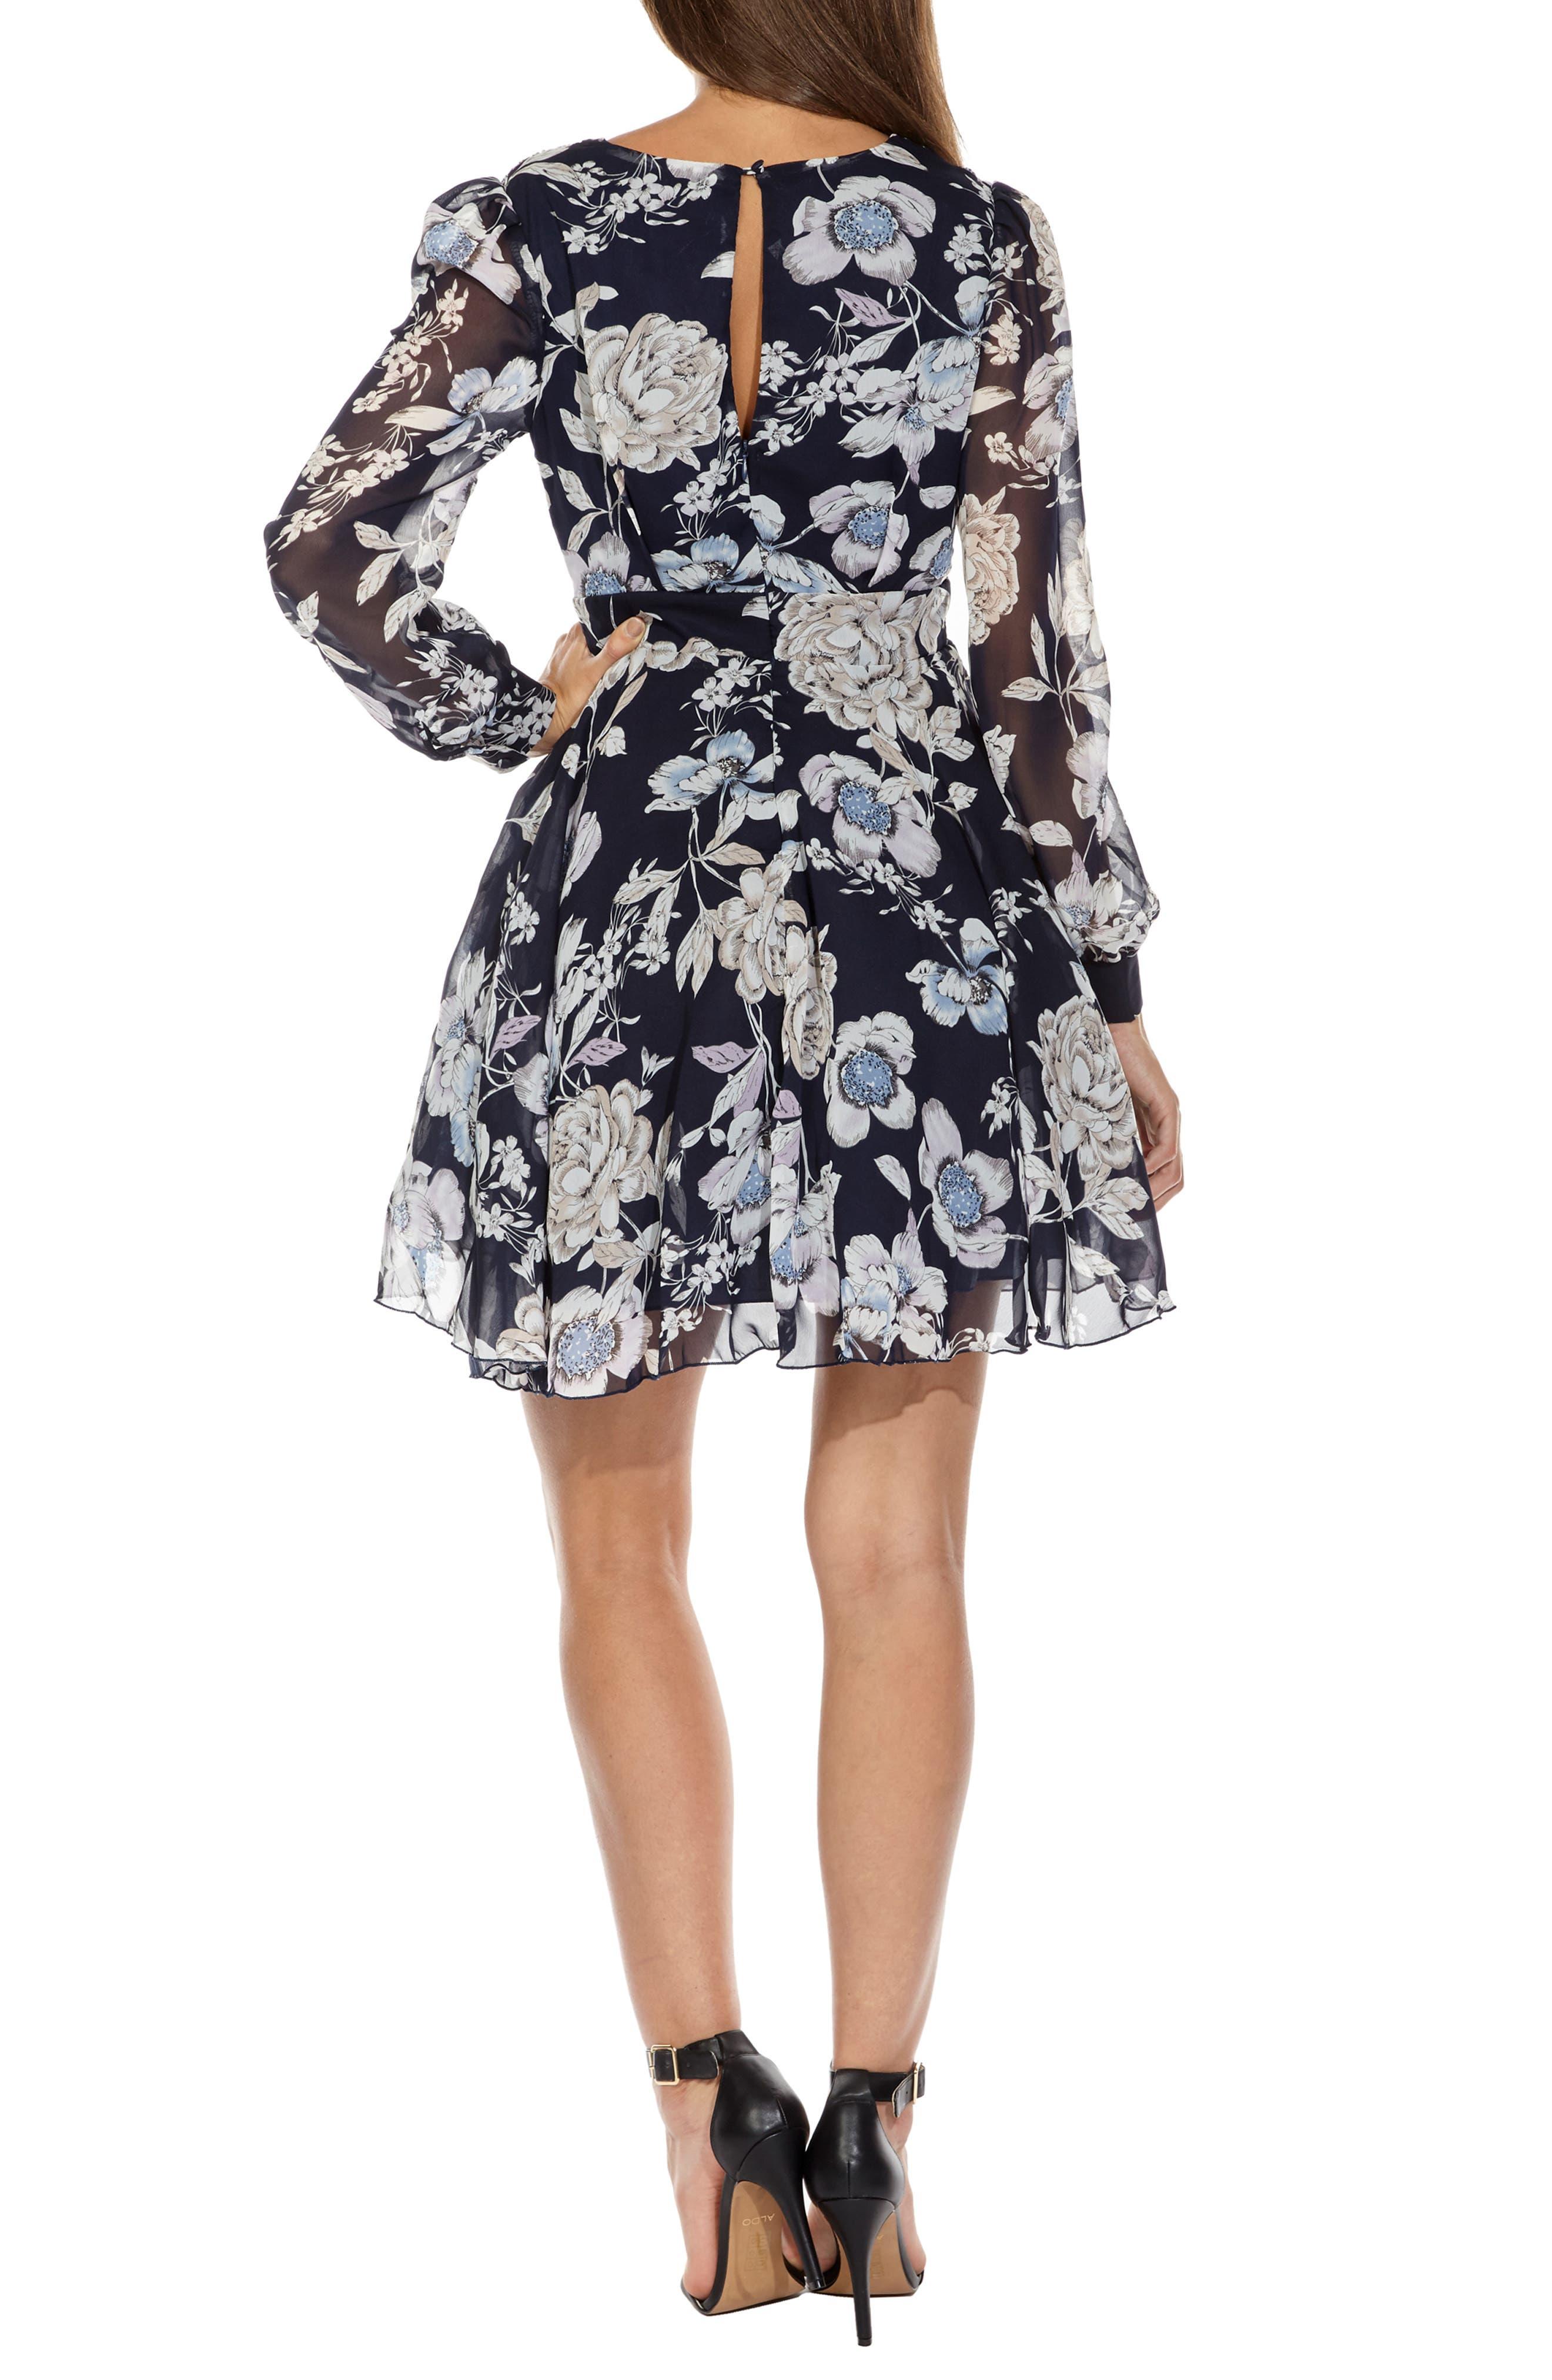 Nordi Floral Fit & Flare Party Dress,                             Alternate thumbnail 2, color,                             FLORAL PRINT